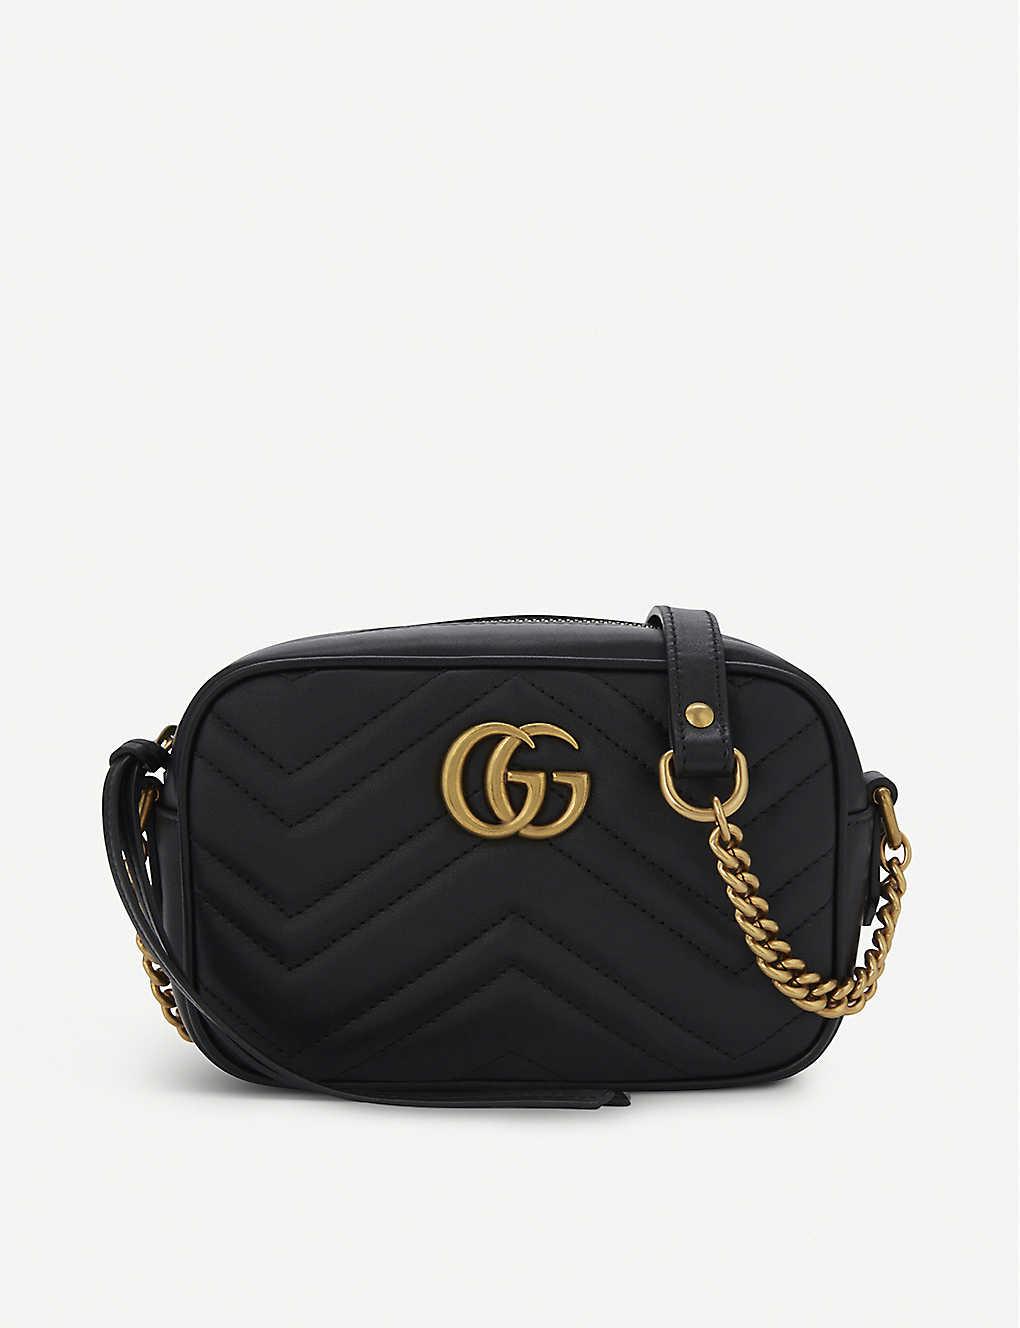 6770776e2 Gucci Leather Bags Price In India- Fenix Toulouse Handball